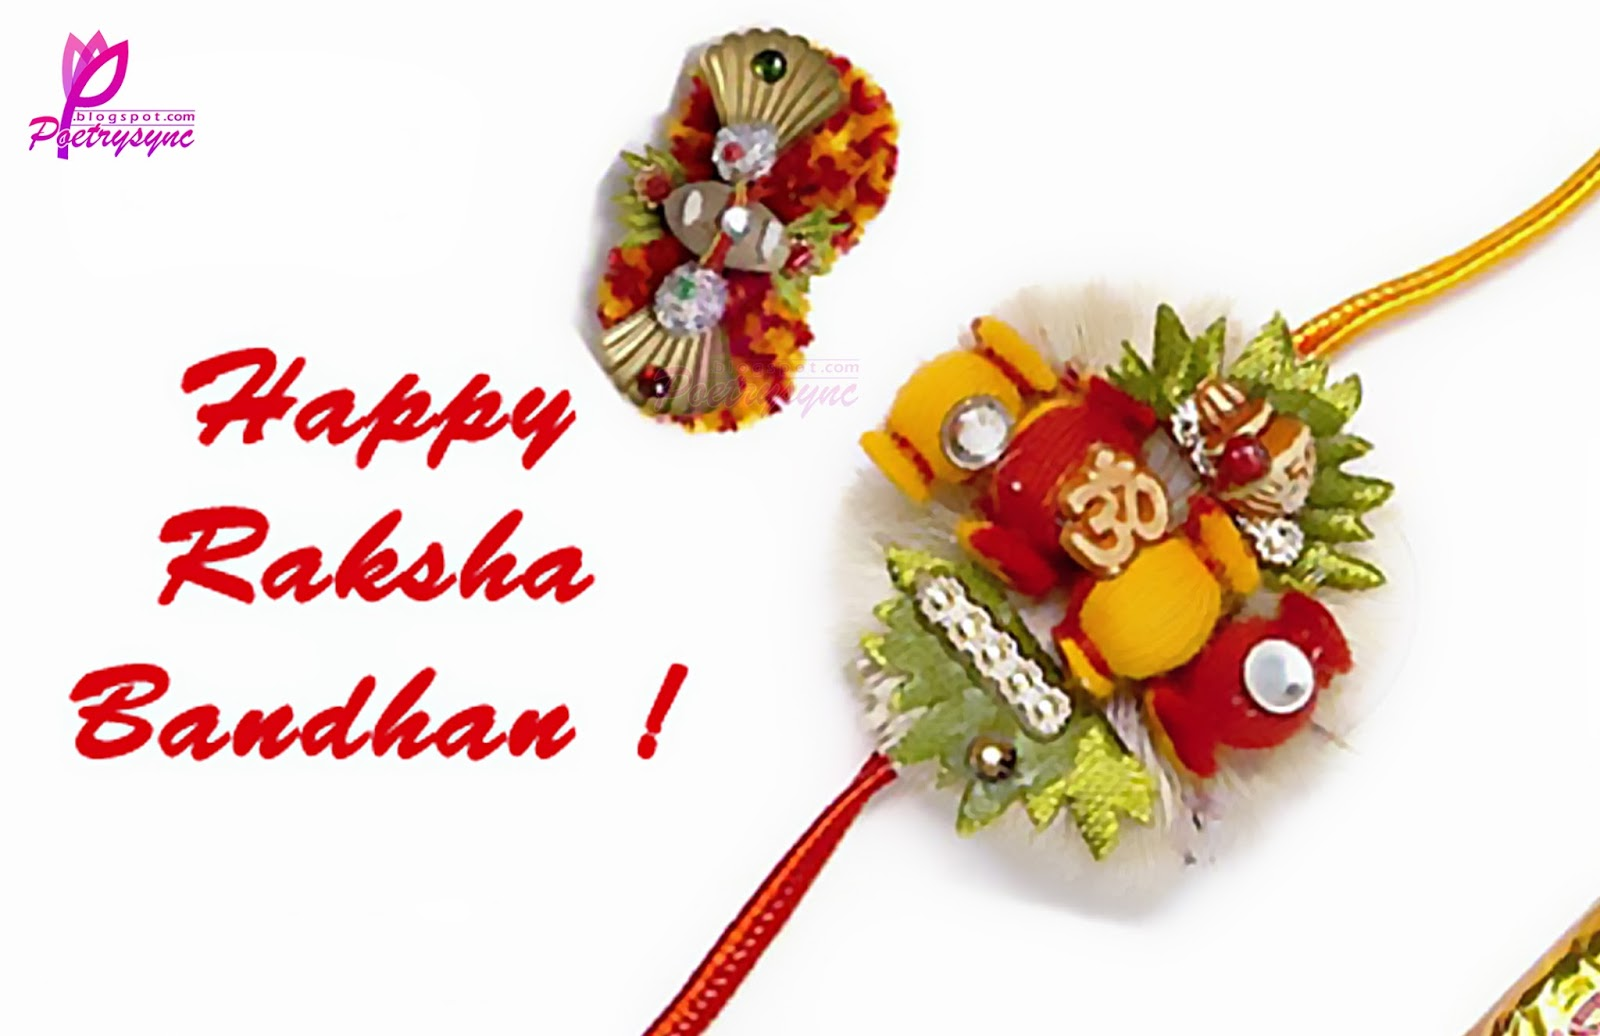 The cultural heritage of india raksha bandhan raakhi poornima raksha bandhan click here for source of image altavistaventures Images